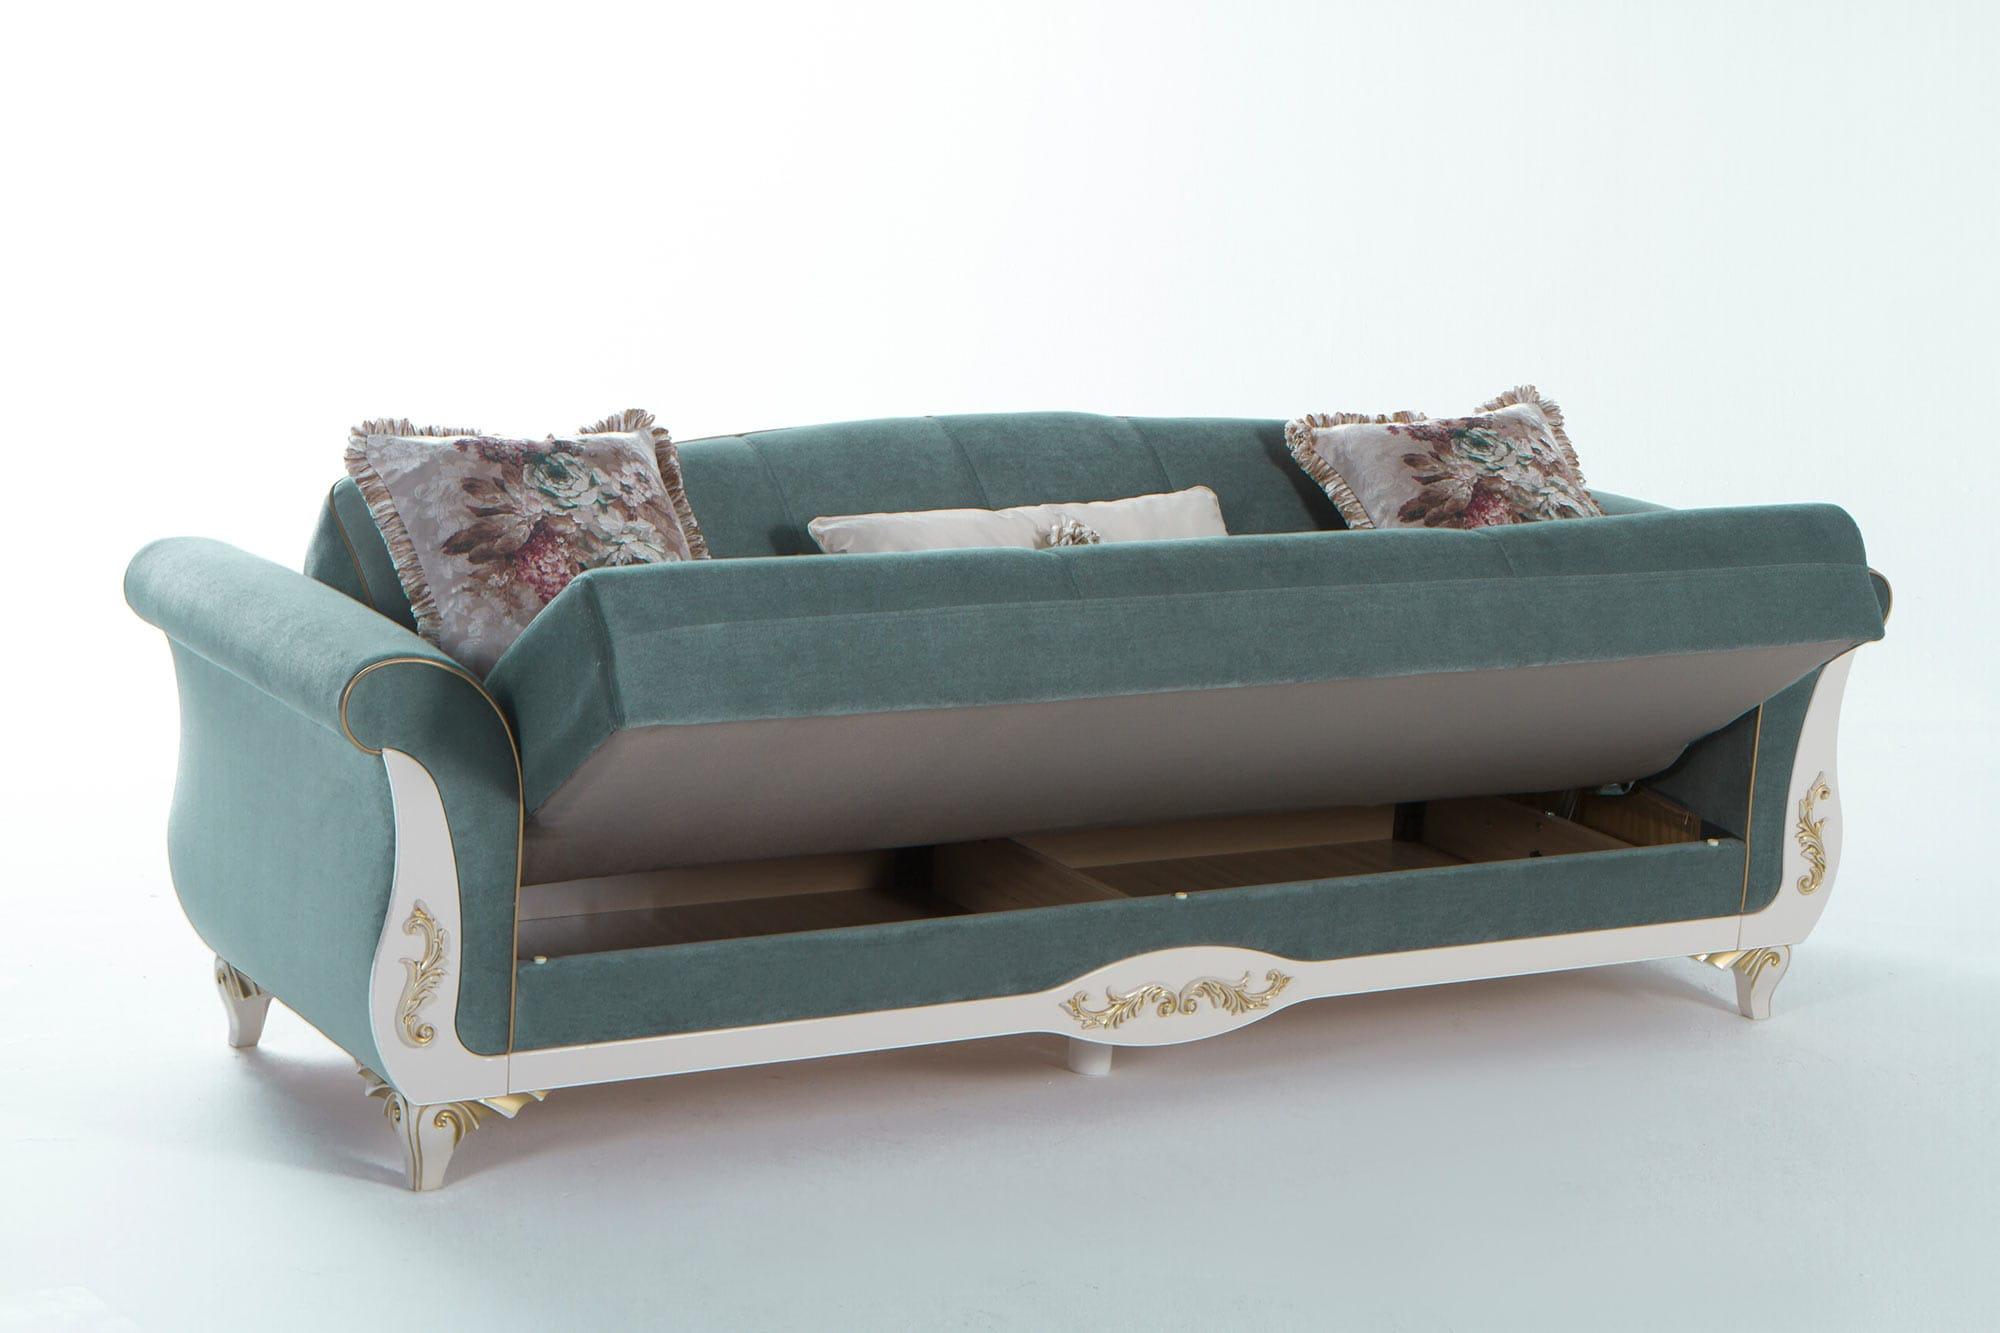 tantra chair ebay making adirondack cushions sofa love ec21 guangzhou sarafurnitures co ltd